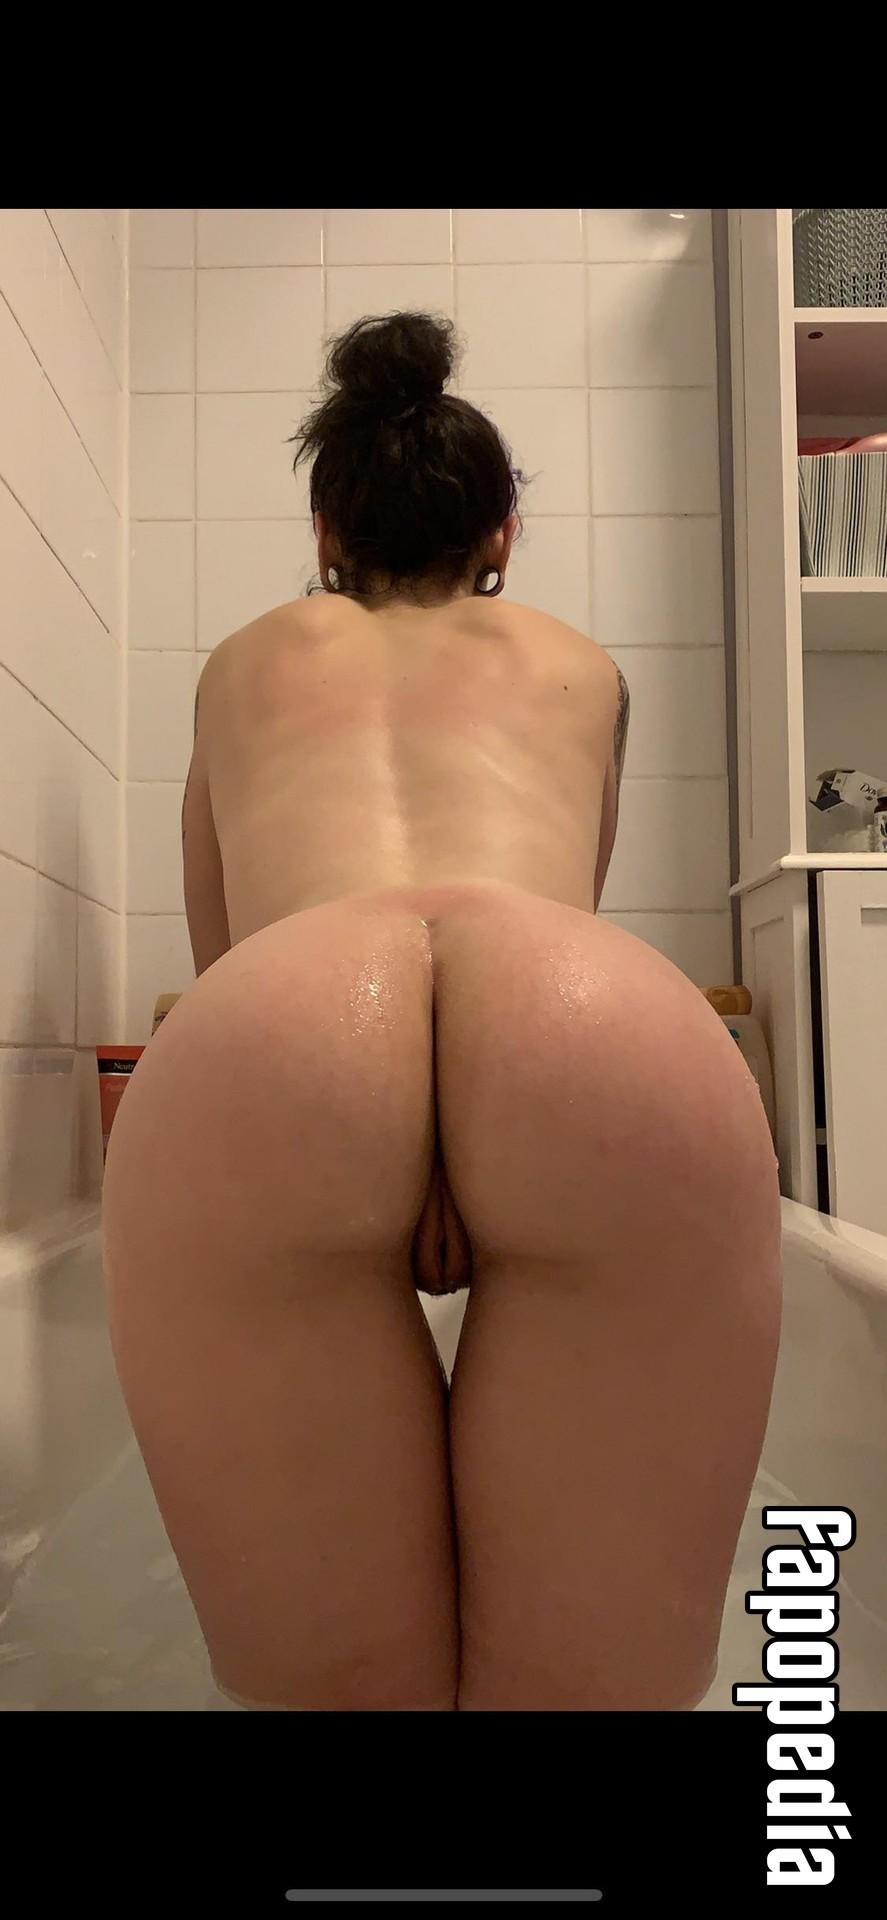 CloseUpHeaven Nude Leaks